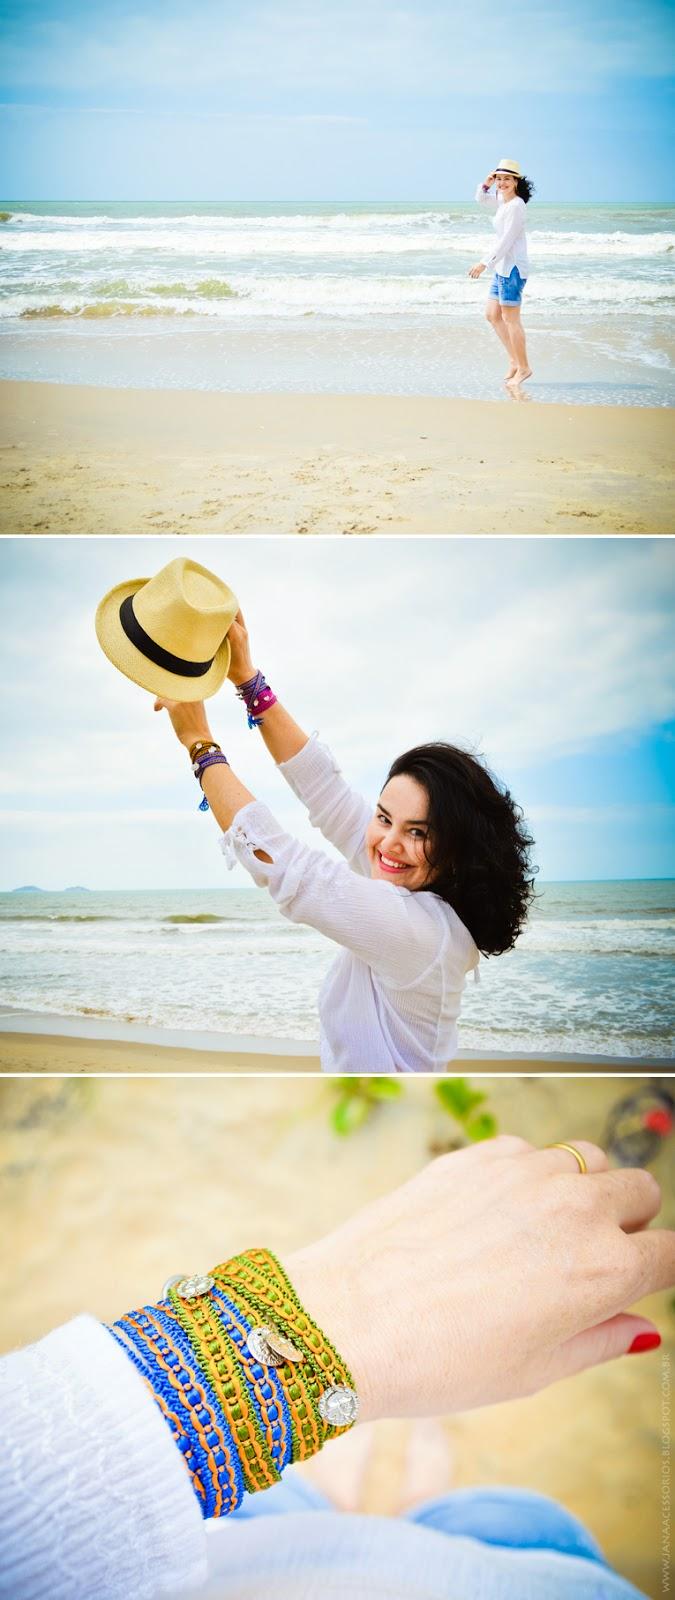 praia, jana acessórios, blogueira, bata, short, blogger, chapéu, panamá, pulseirismo, blog da jana, joinville, blogueira, jana, moda, estilo, blogger, chemisier, Look da Jana